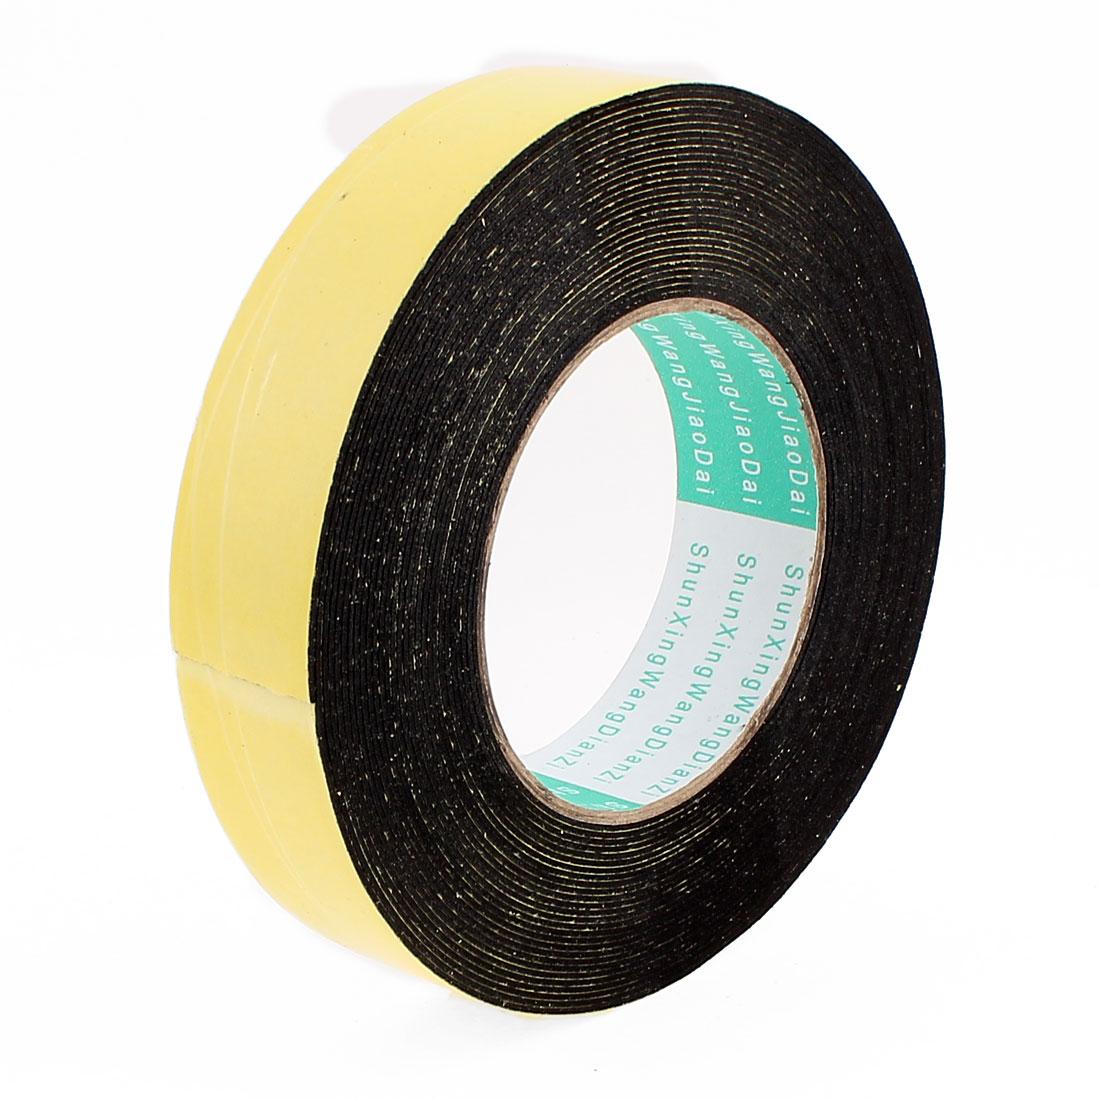 10 Meters 30mm x 1mm Single Side Adhesive EVA Foam Sealing Tap